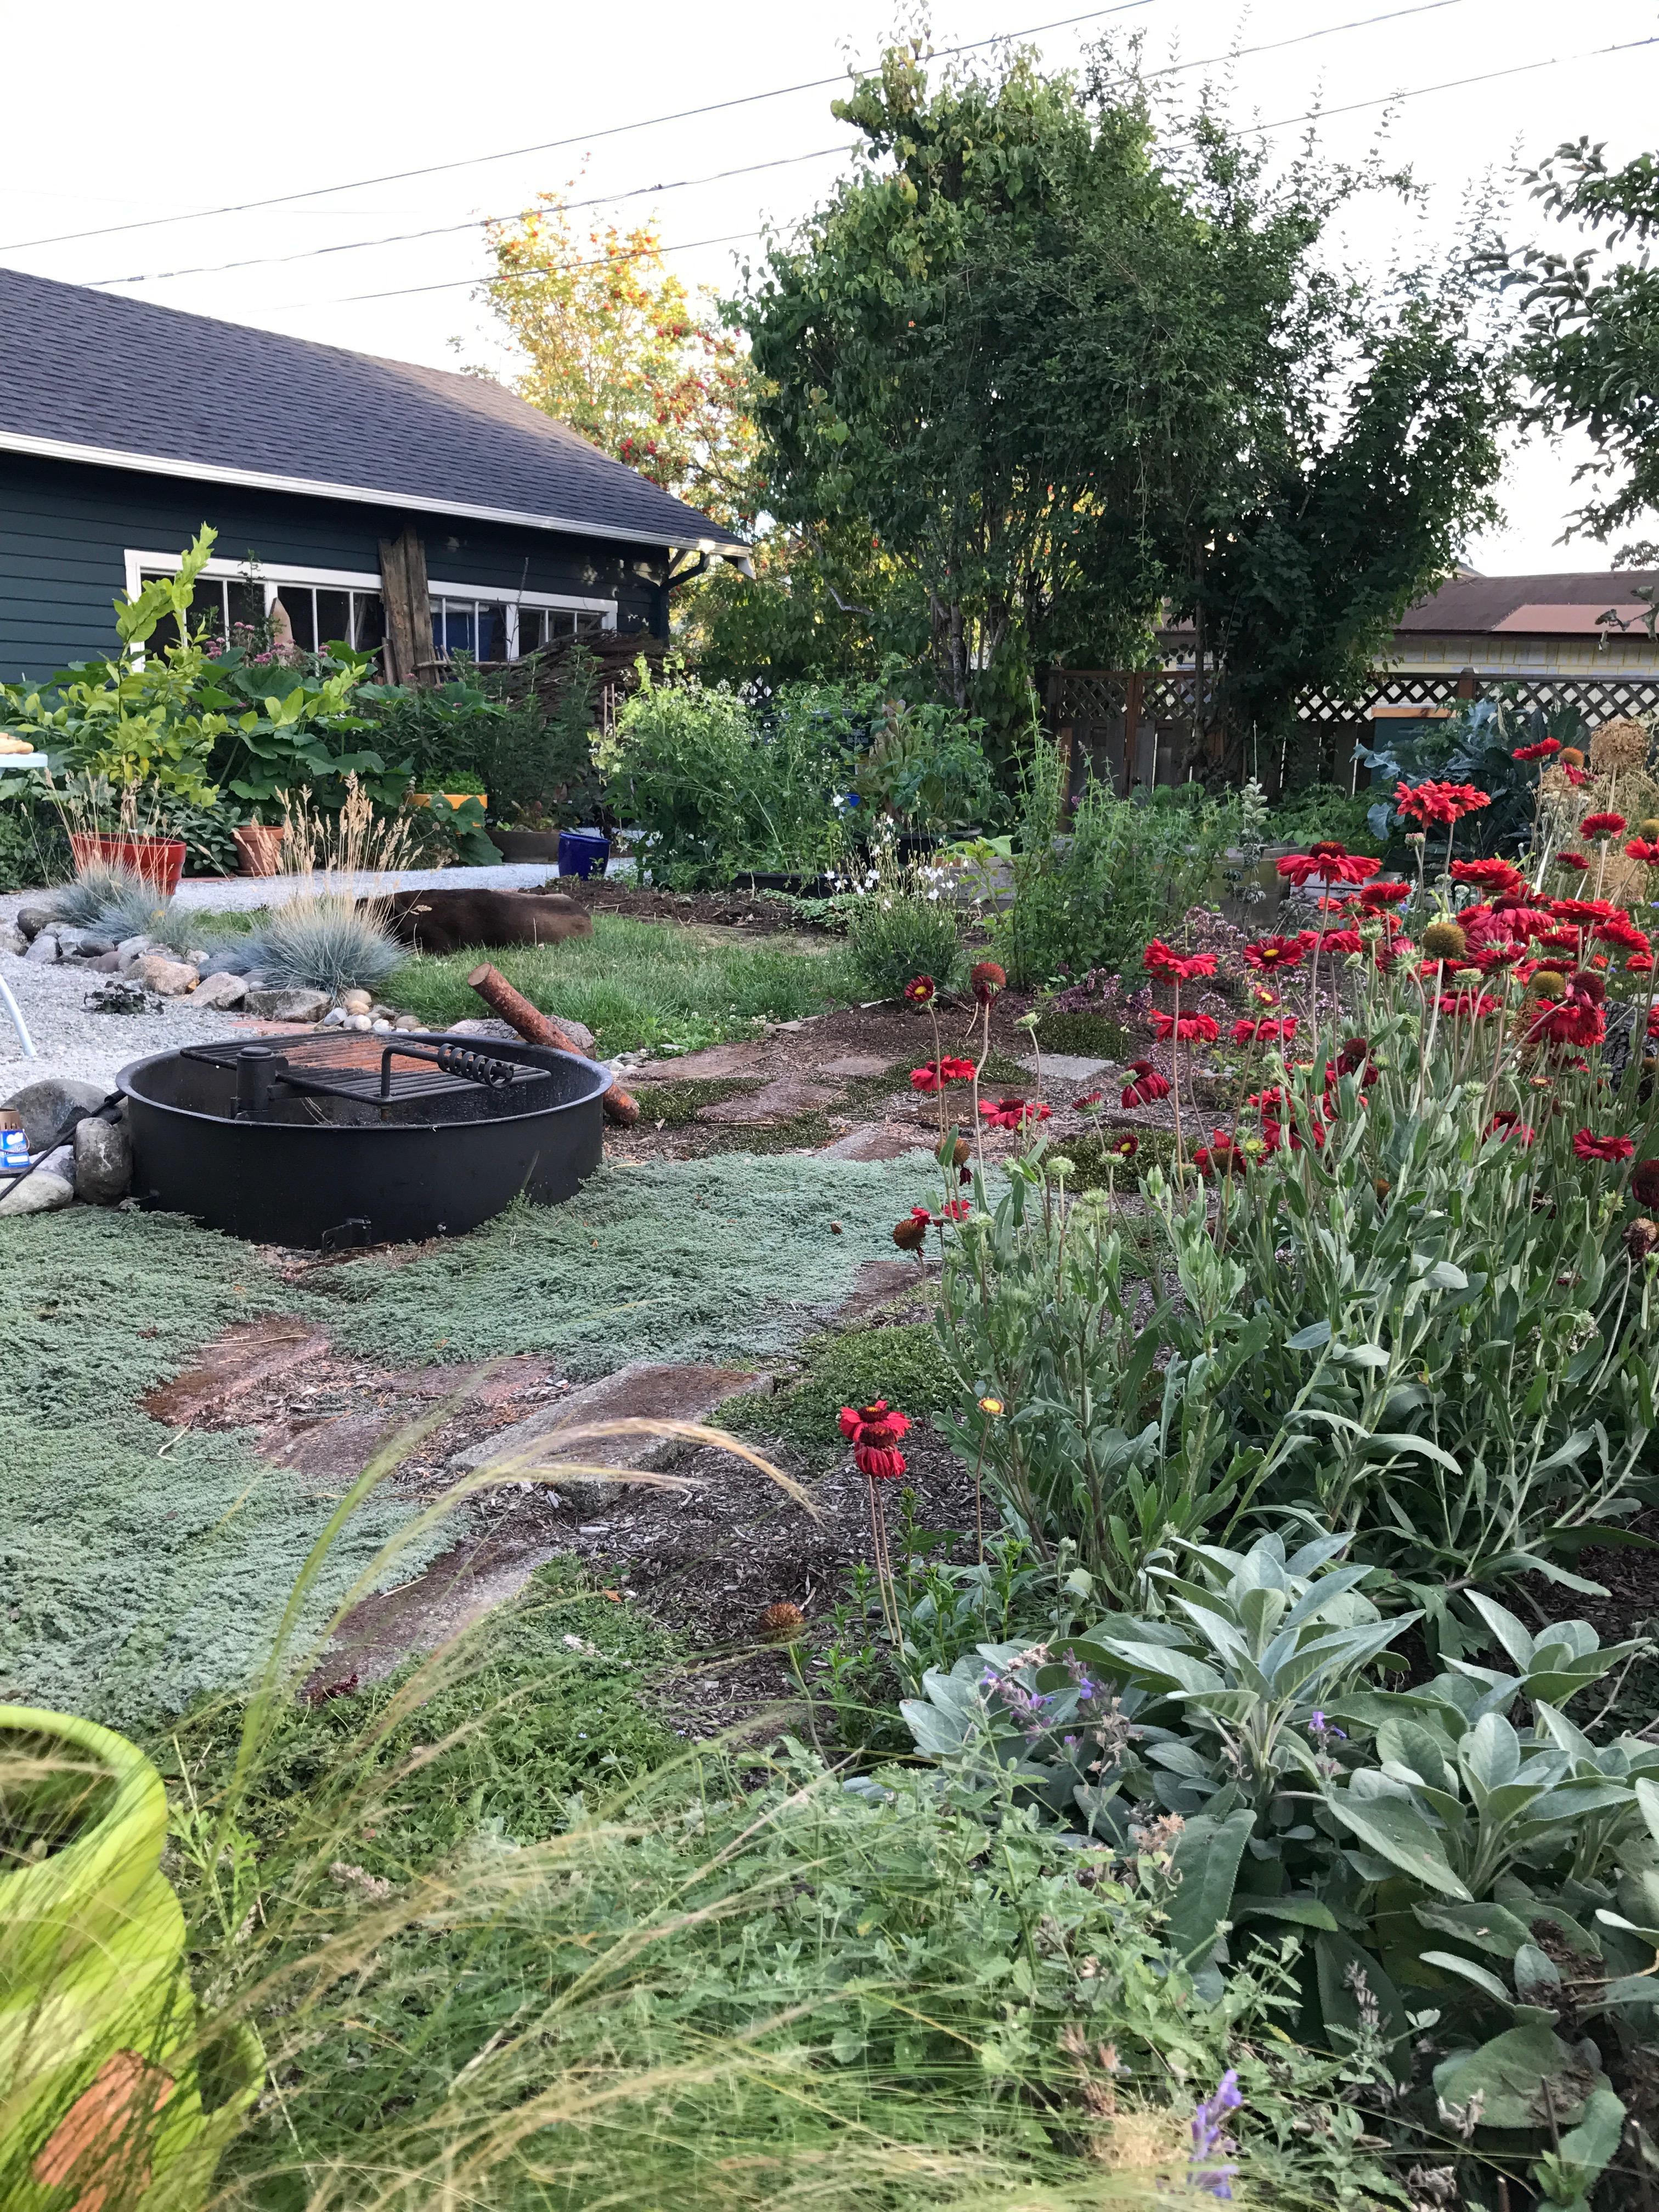 Photo of garden: firepit, gaillardia, Mexican feather grass